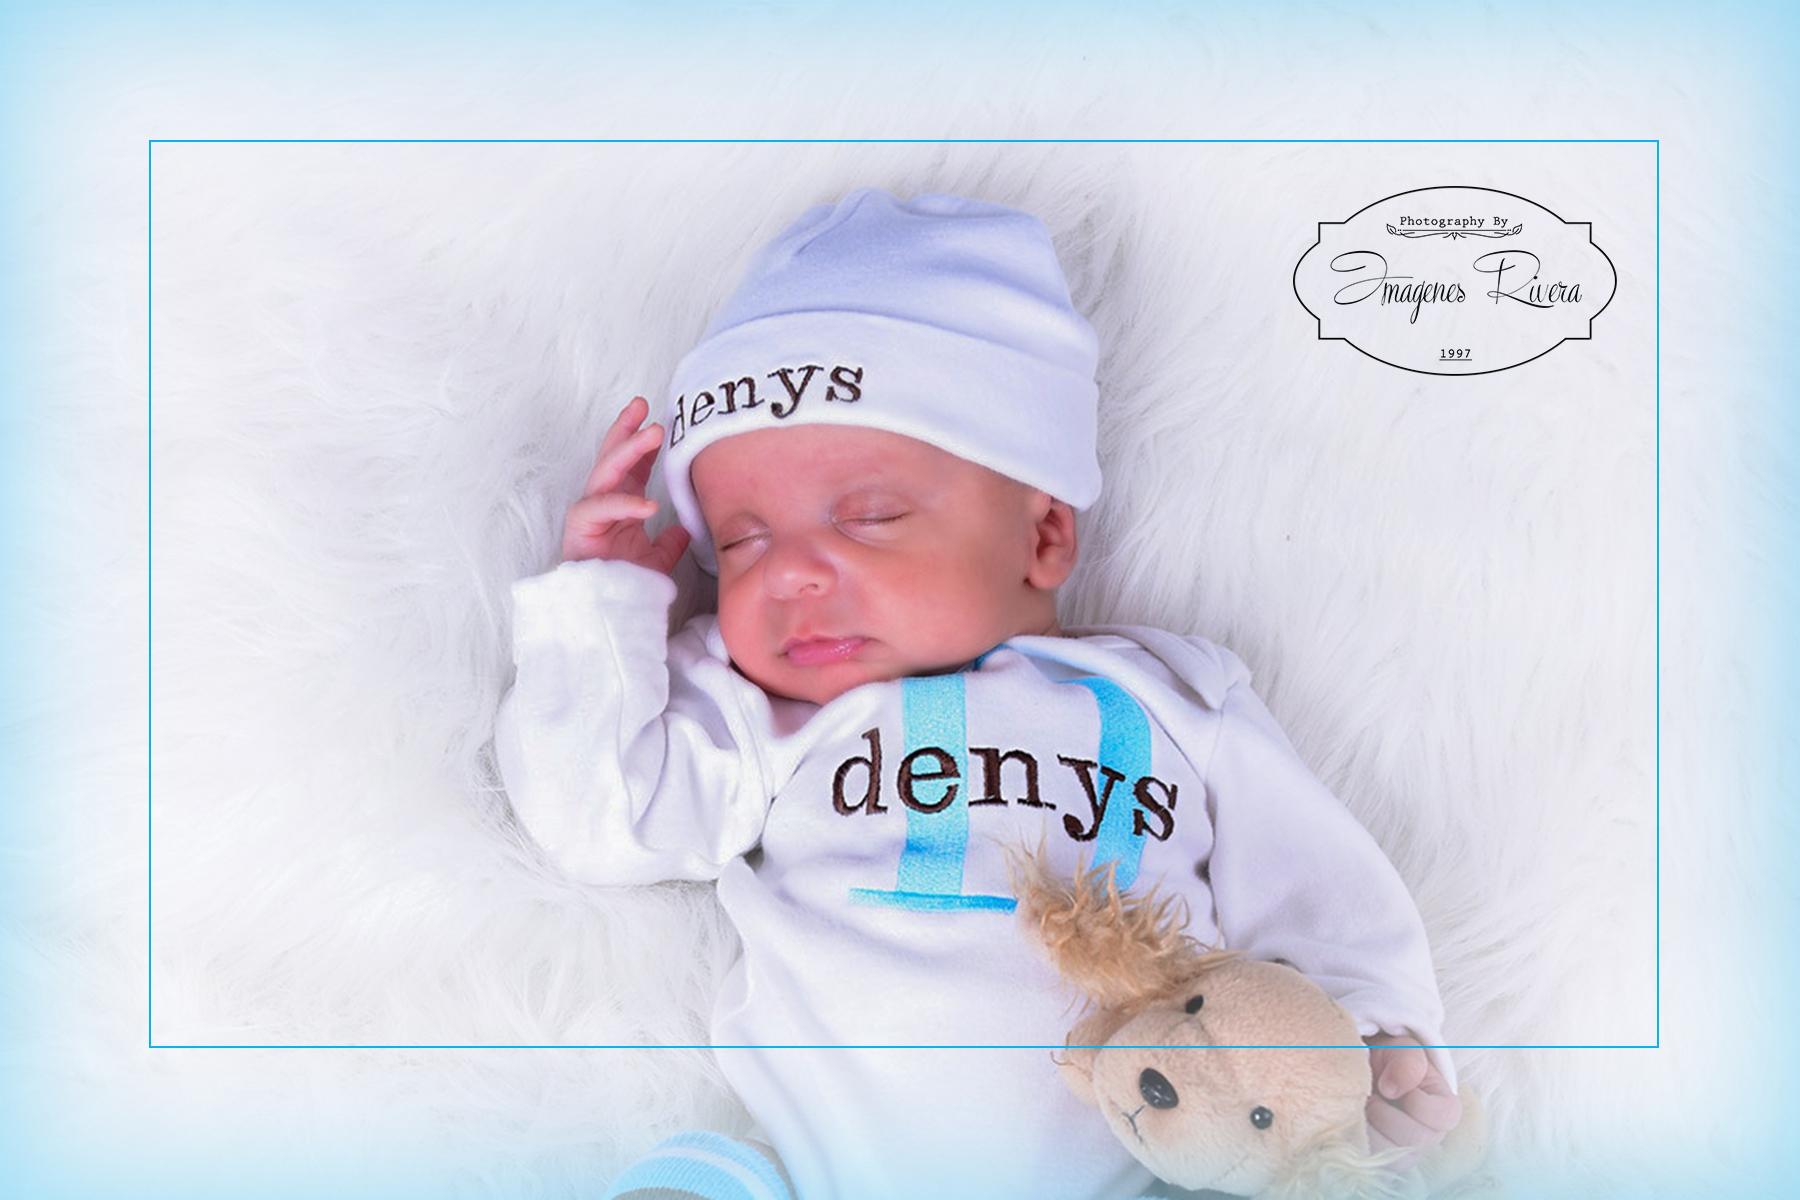 ♥ Denys & Damian twins newborn photography | Imagenes Rivera ♥